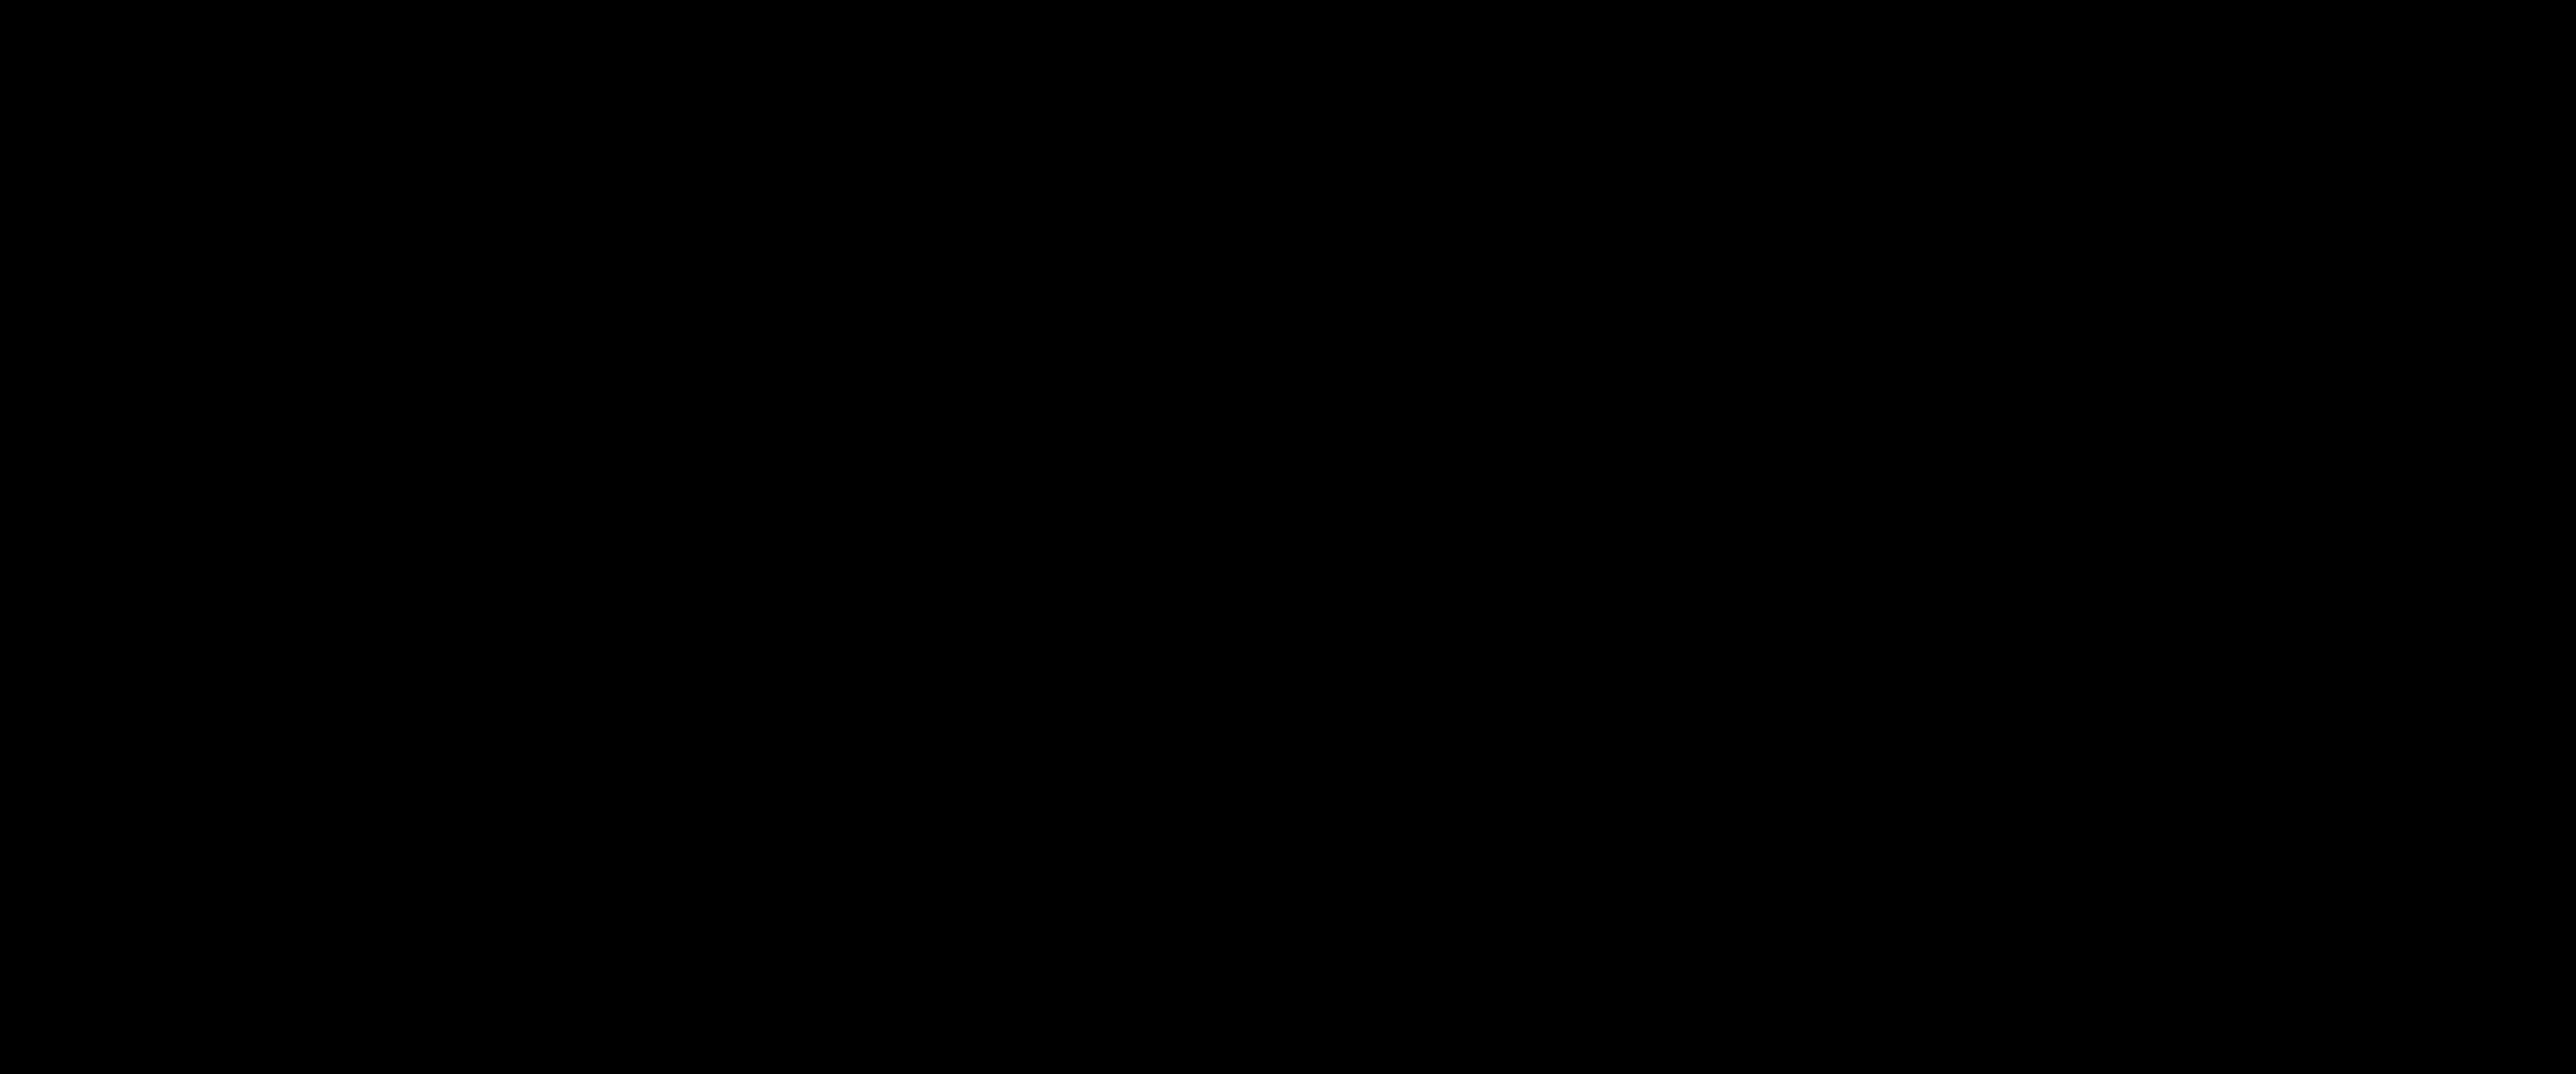 AF 12198